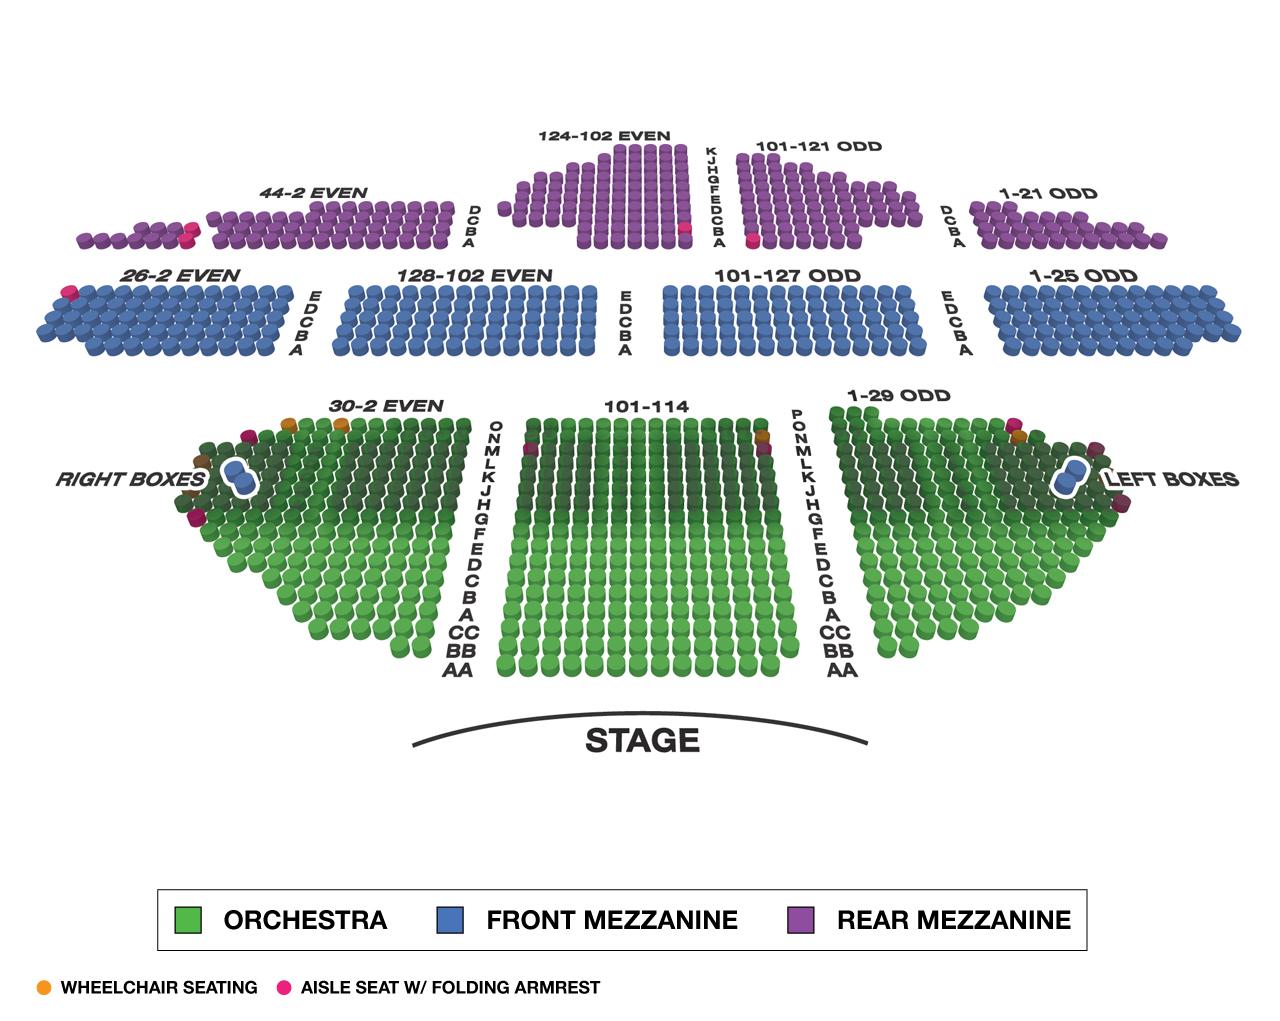 Ambassador Theatre Broadway 3D Seating Chart Large